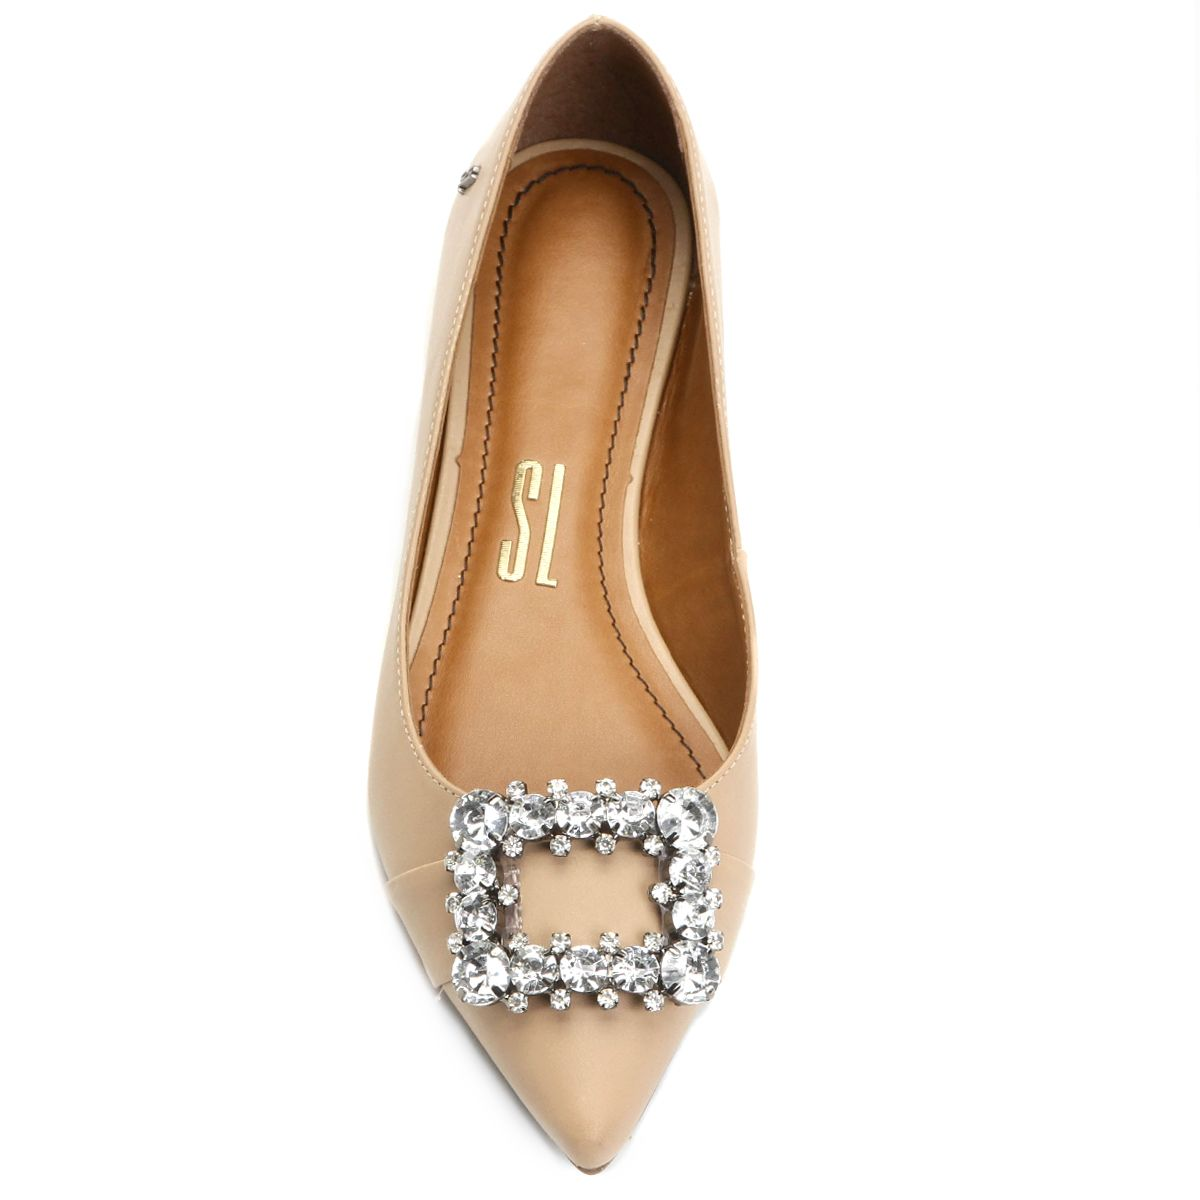 bbb663cfef7 Compre Sapatilha Santa Lolla Fivela Pedraria Bege na Zattini a nova loja de  moda online da Netshoes. Encontre Sapatos